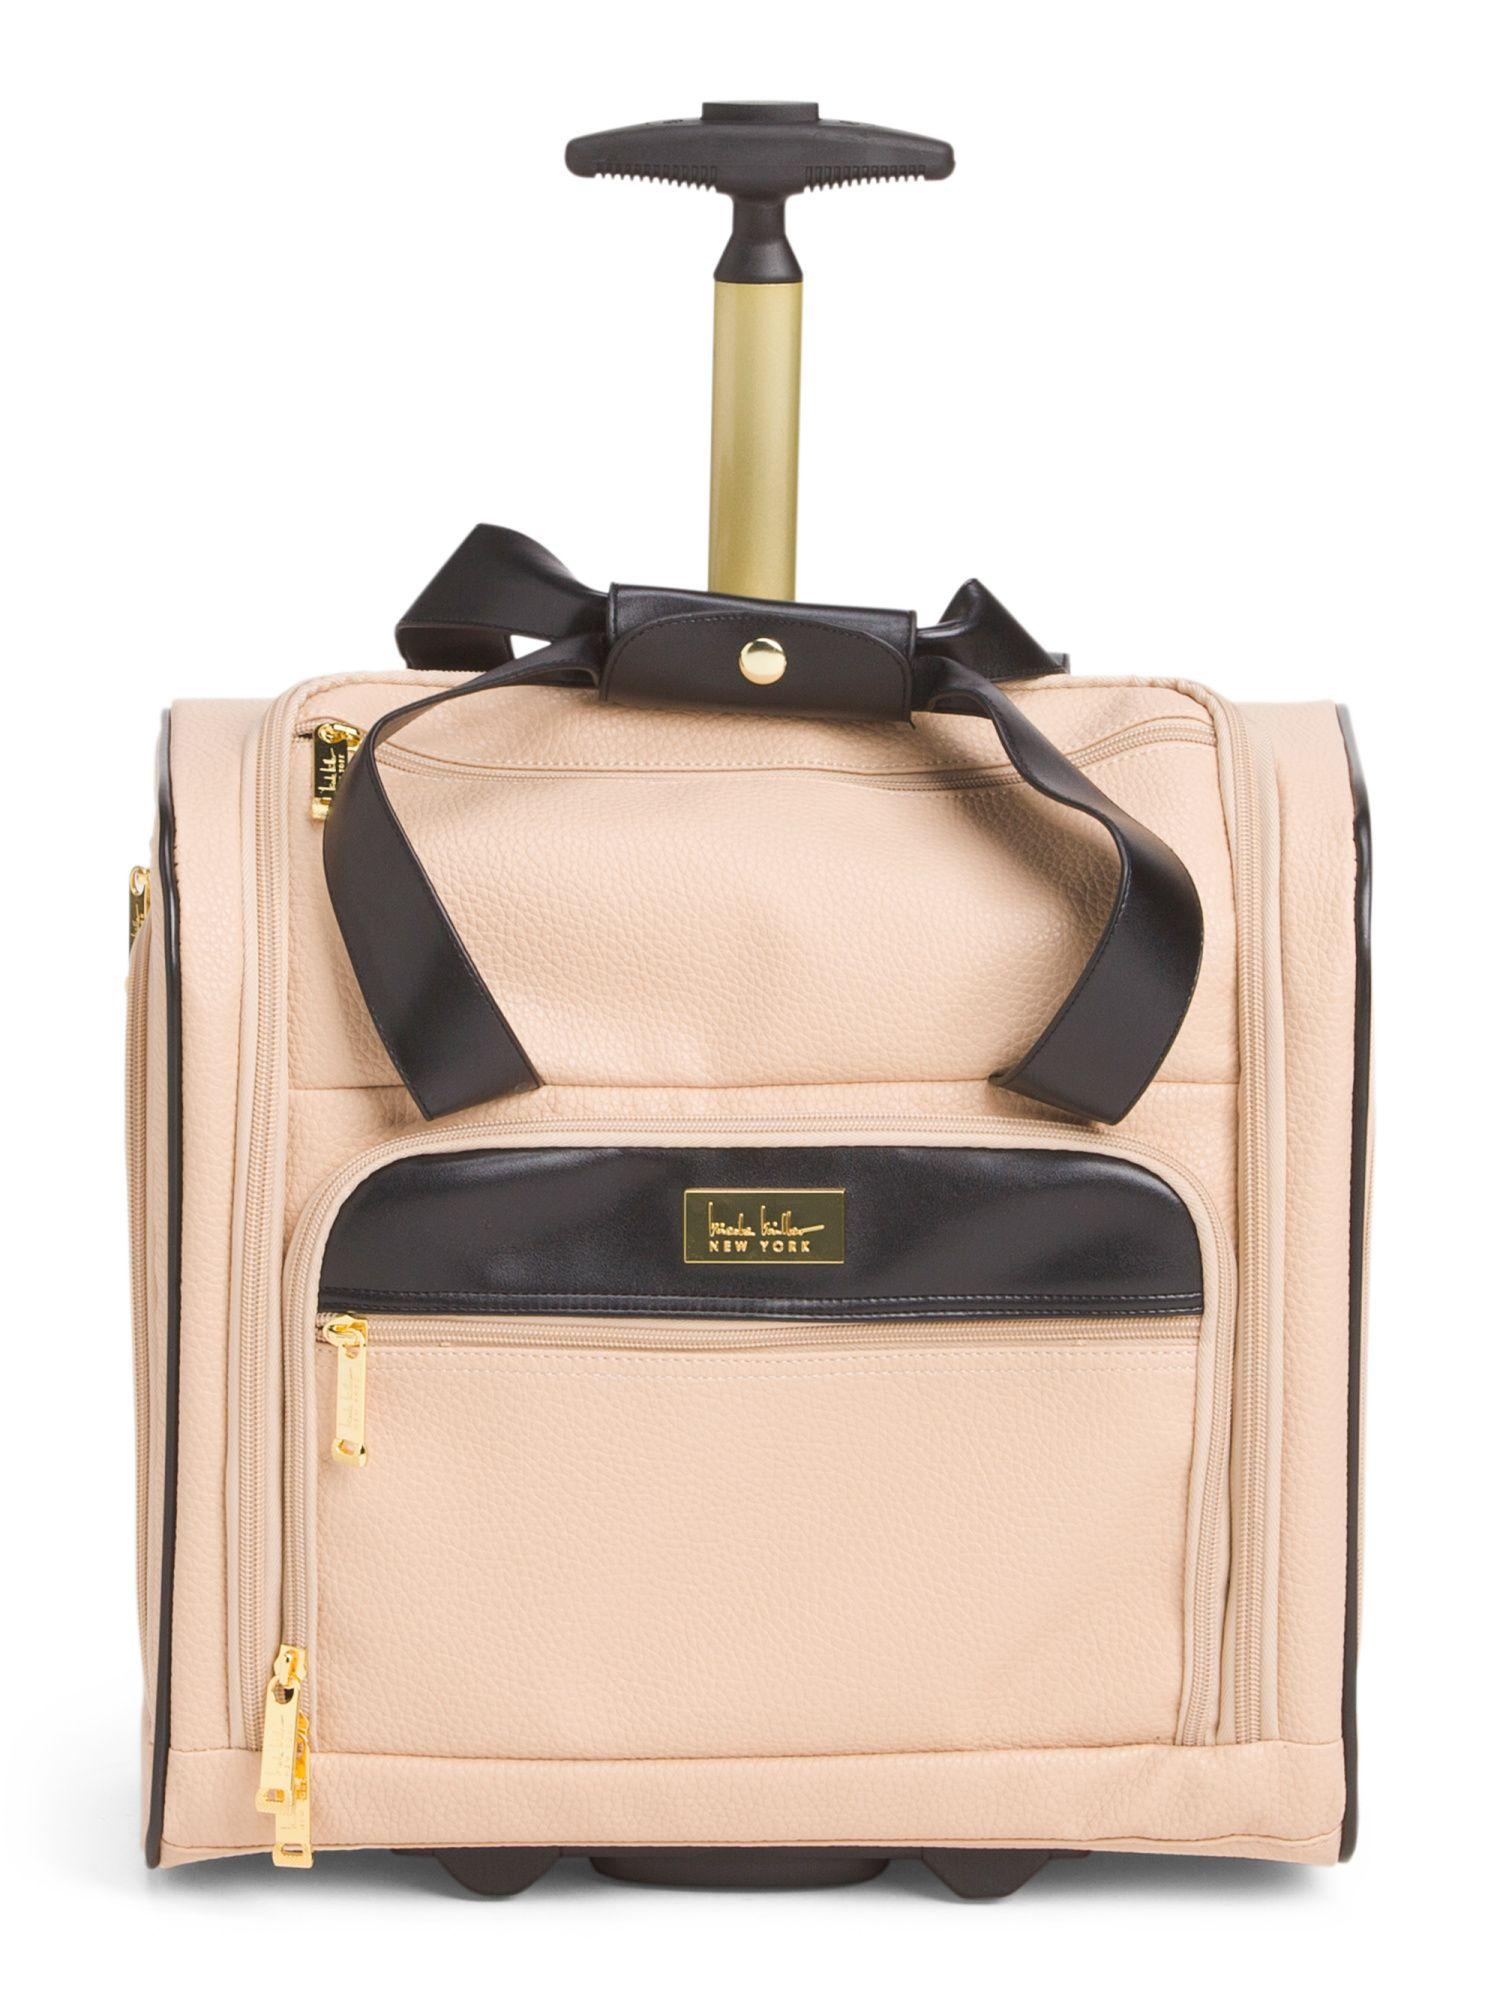 c1ca11d7e366 NICOLE MILLER 15in Sharon Under Seat Bag